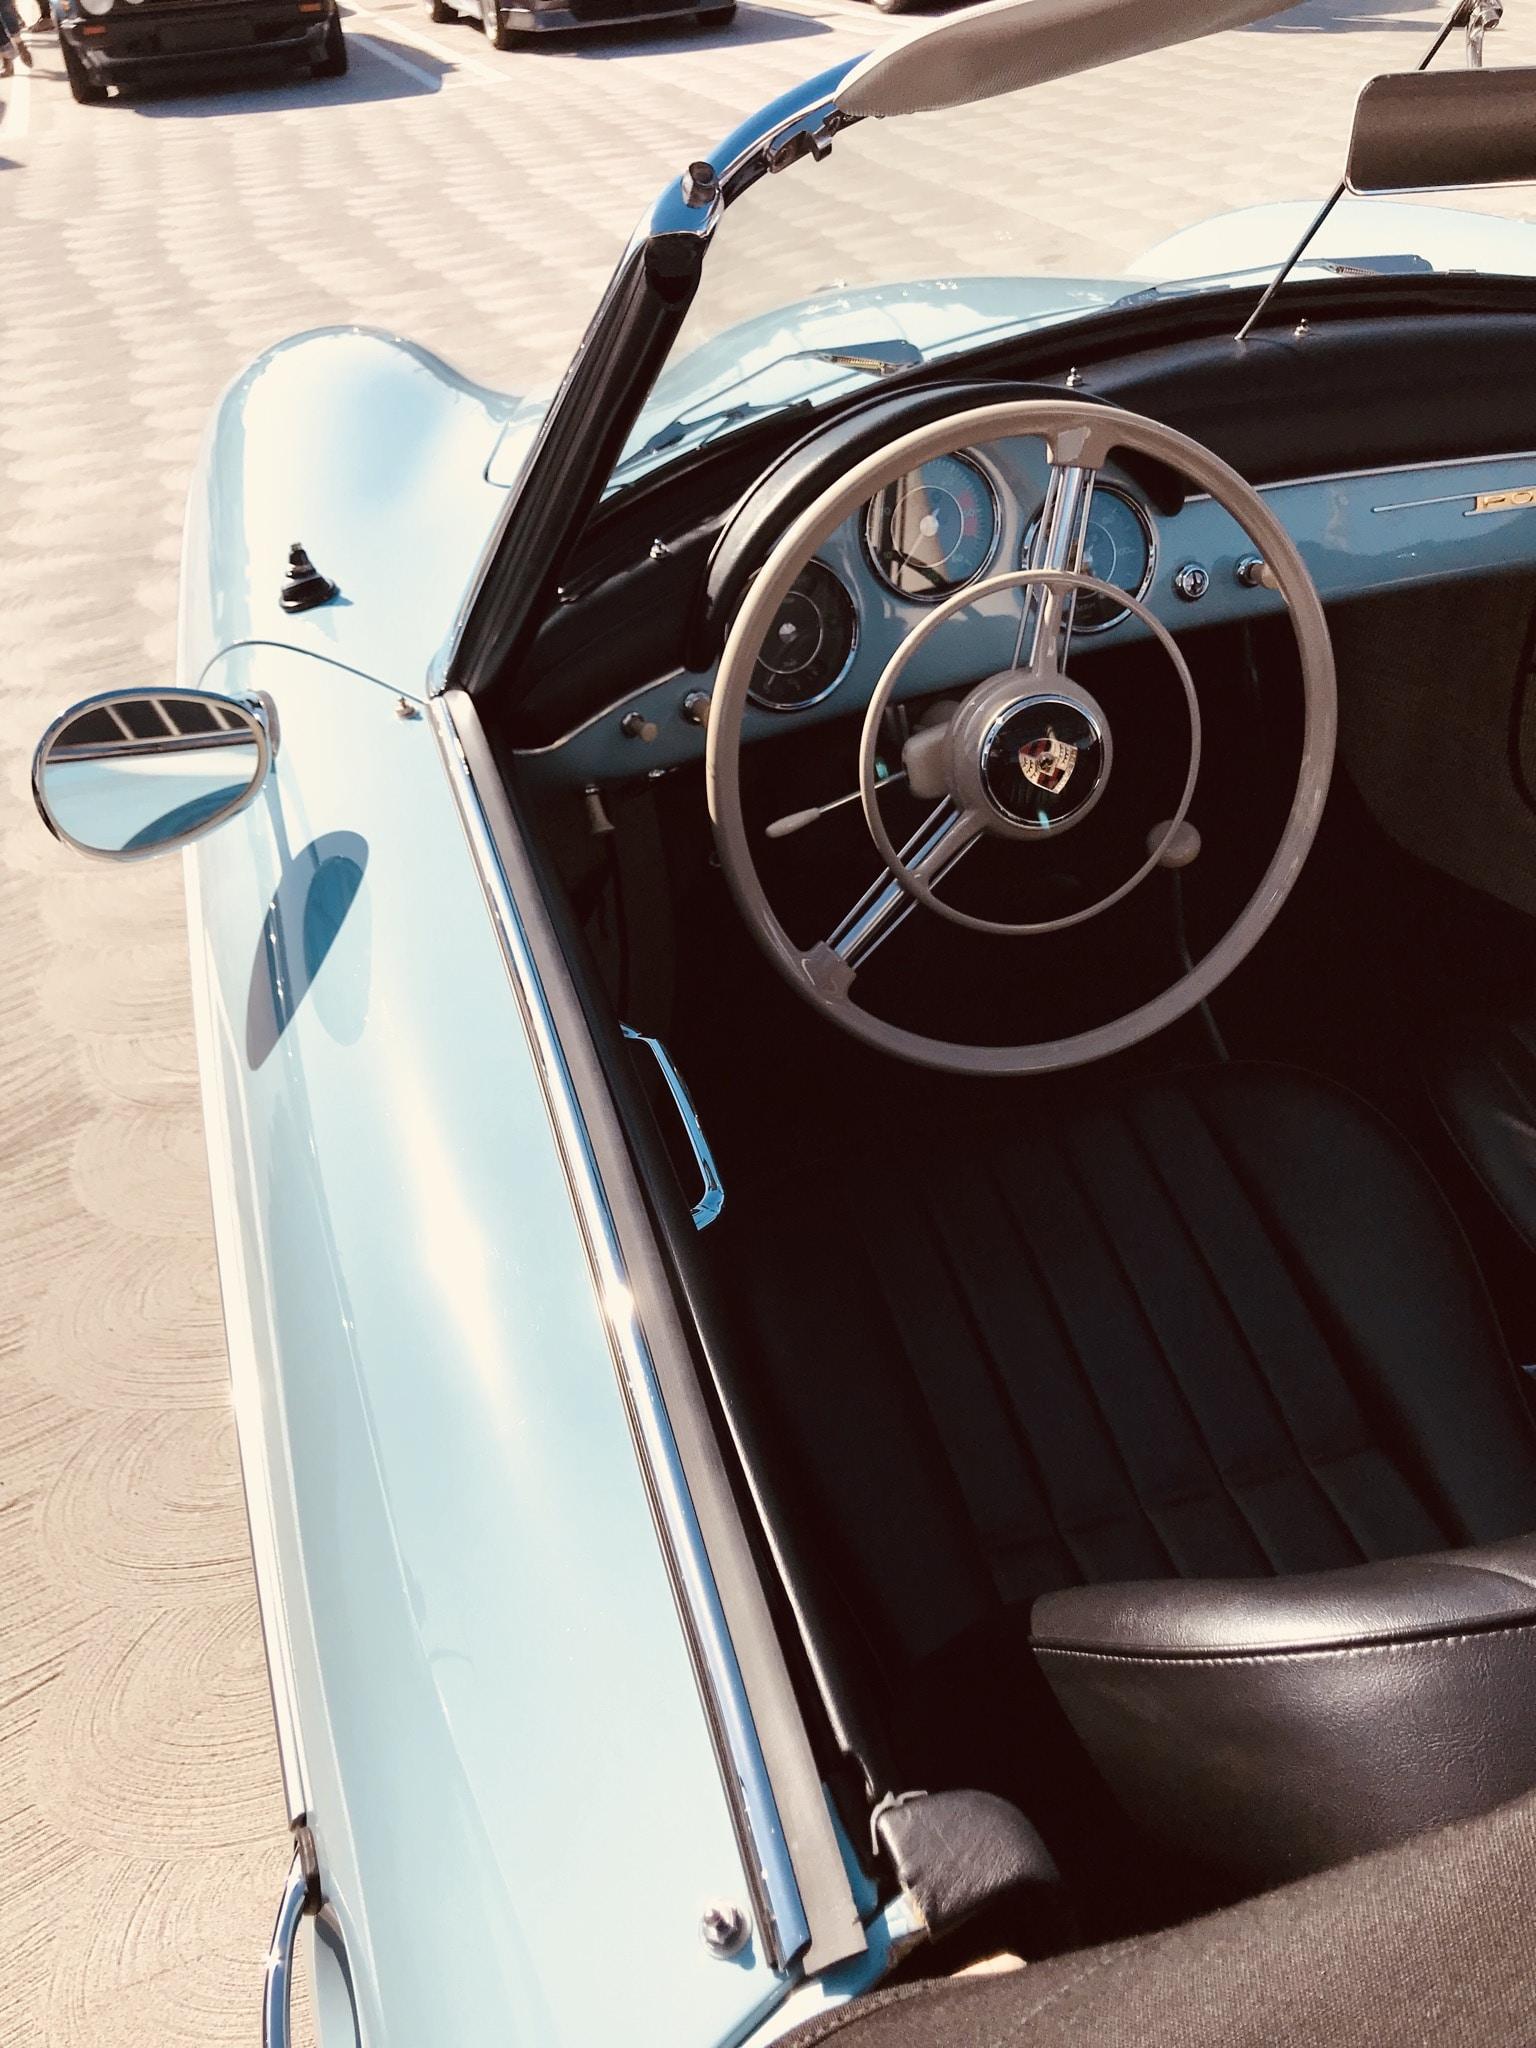 Porsche convertible parked on brown floor